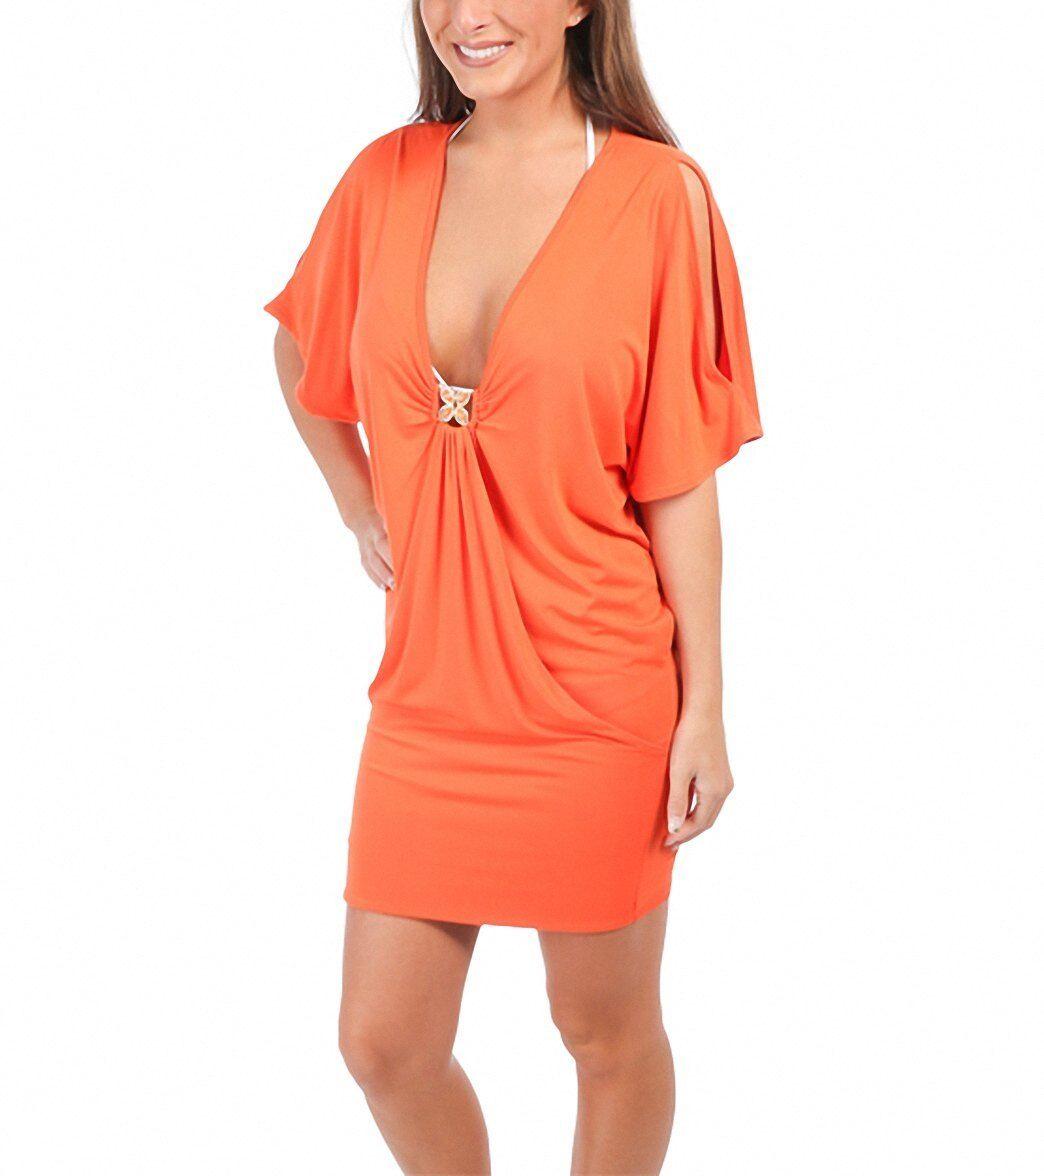 Trina Turk Tangerine orange Nomad Solid Tunic Jersey Dress Beach Swim Cover Sz S